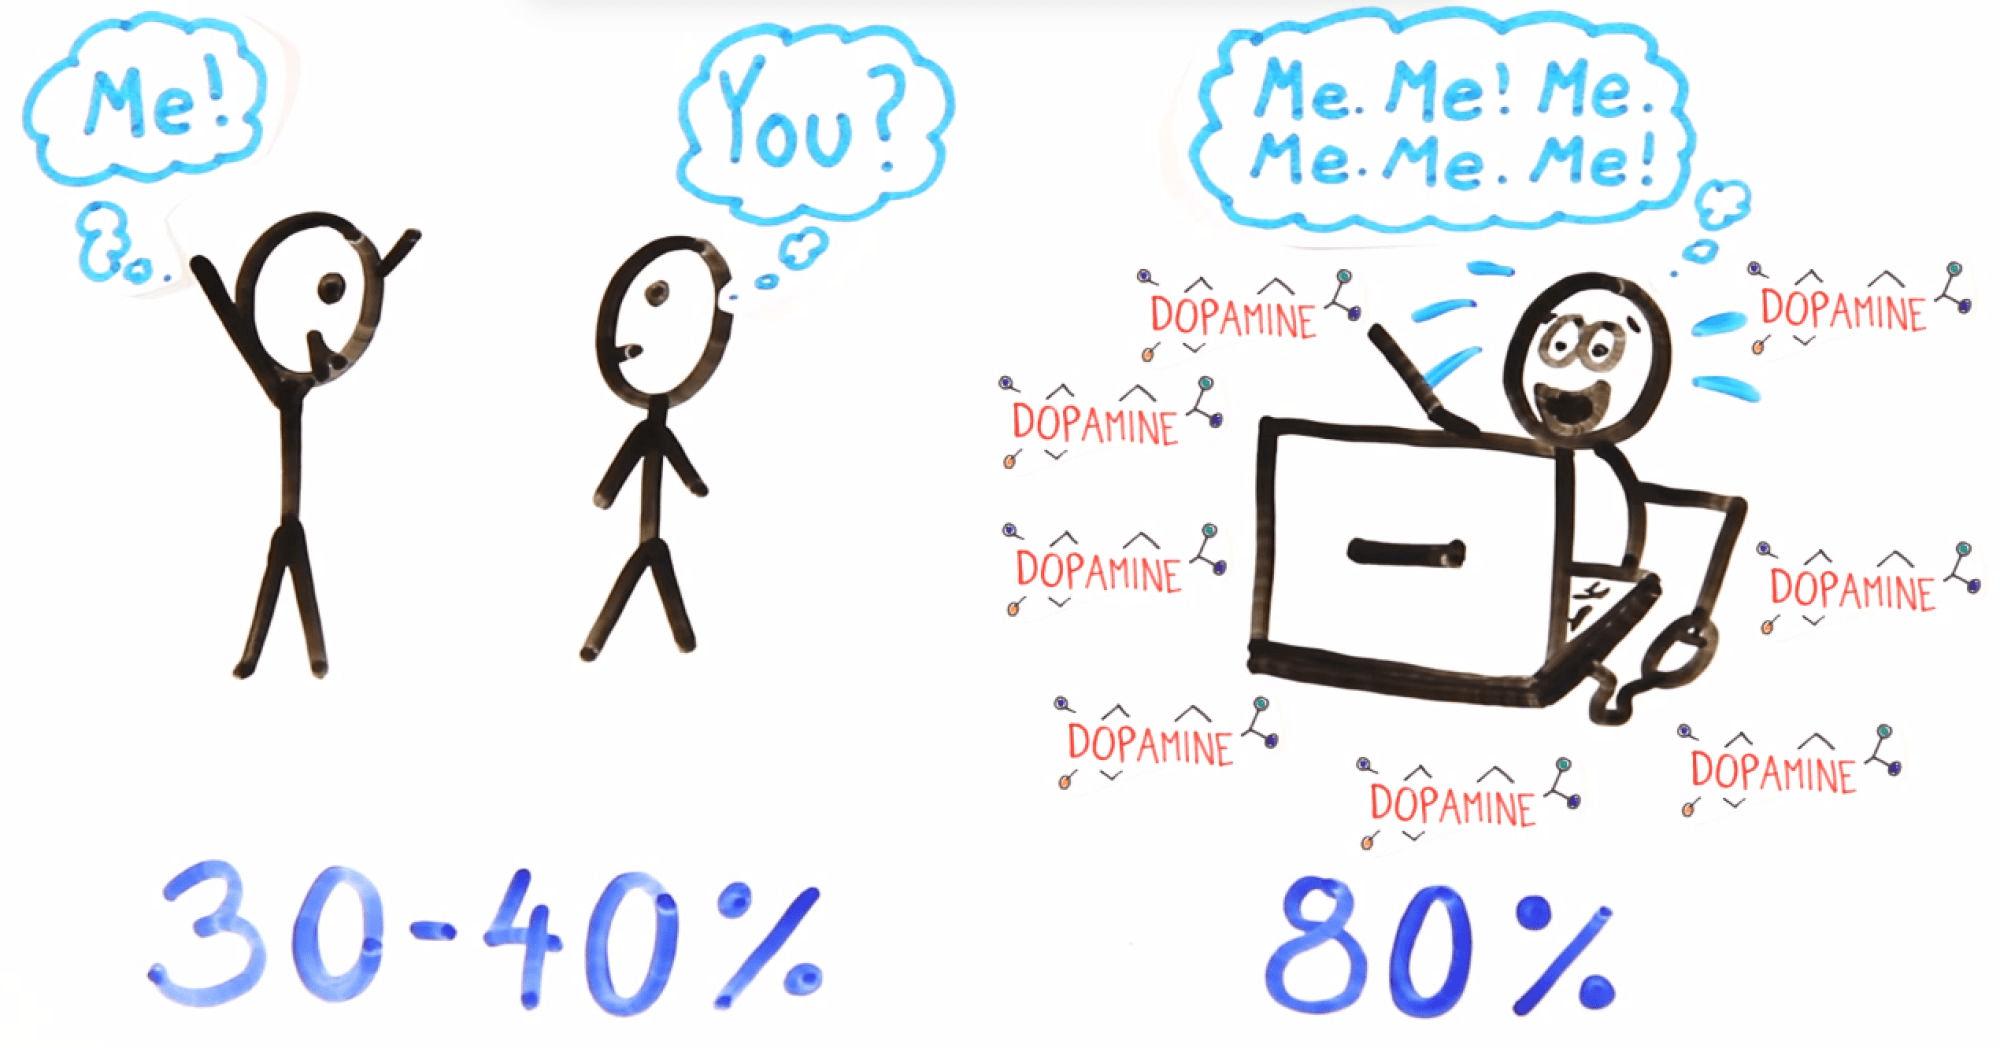 social media narcisism